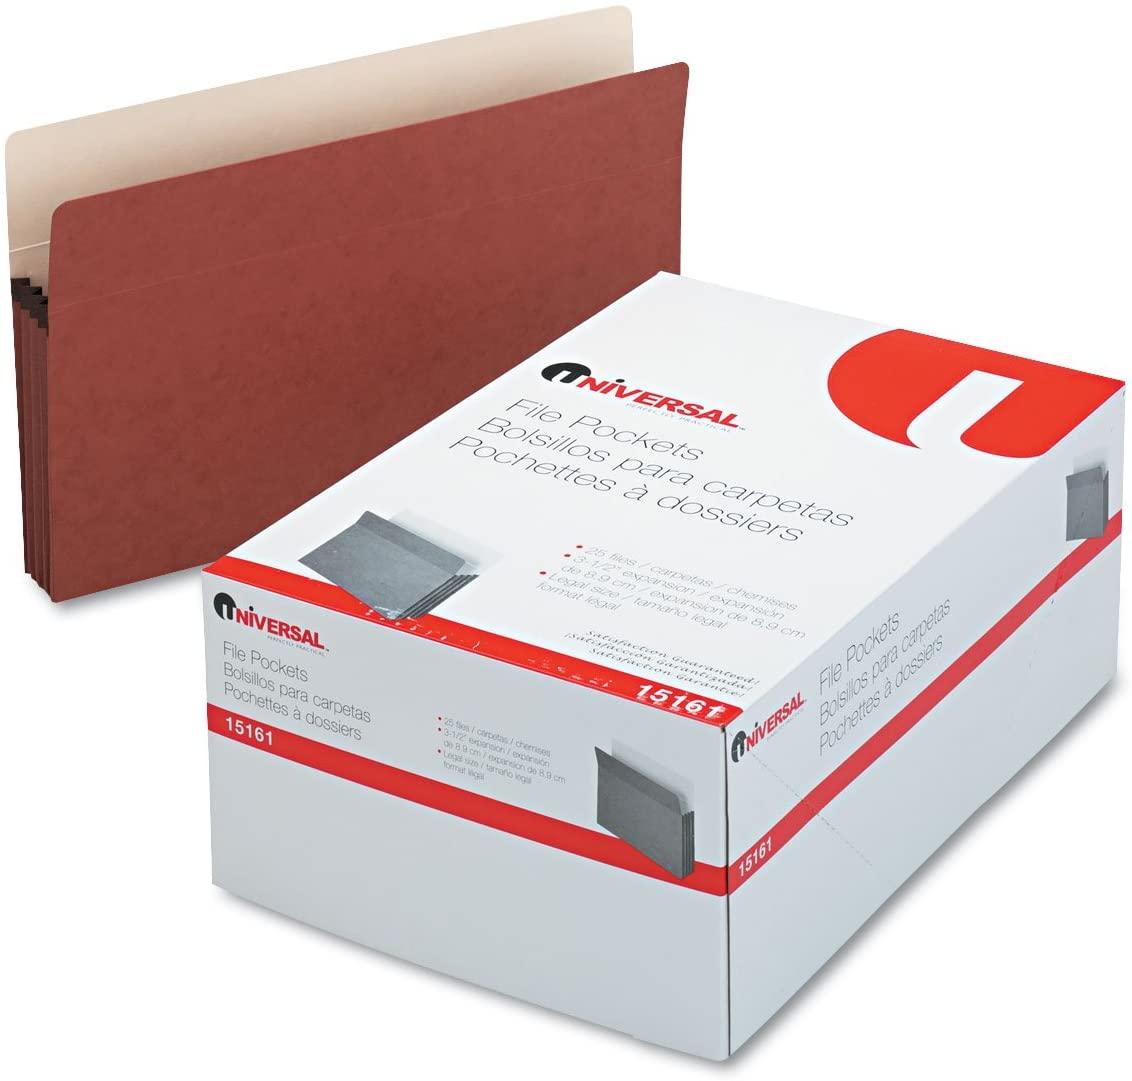 Universal 15161 3 1/2 Inch Expansion File Pockets, Straight Tab, Legal, Redrope/Manila, 25/Box